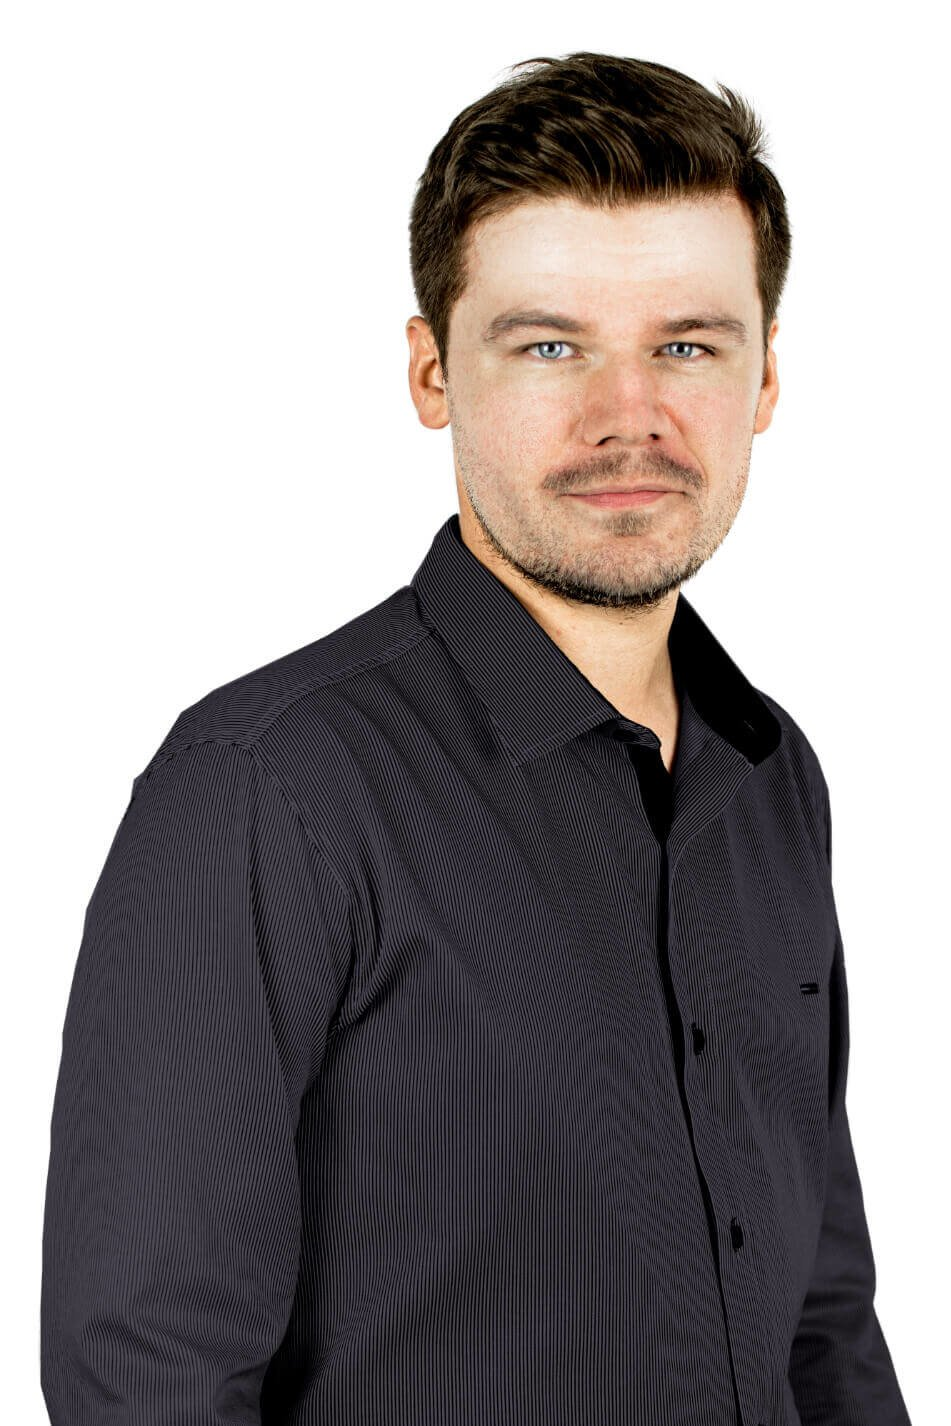 Maciej Duszynski - Career Expert